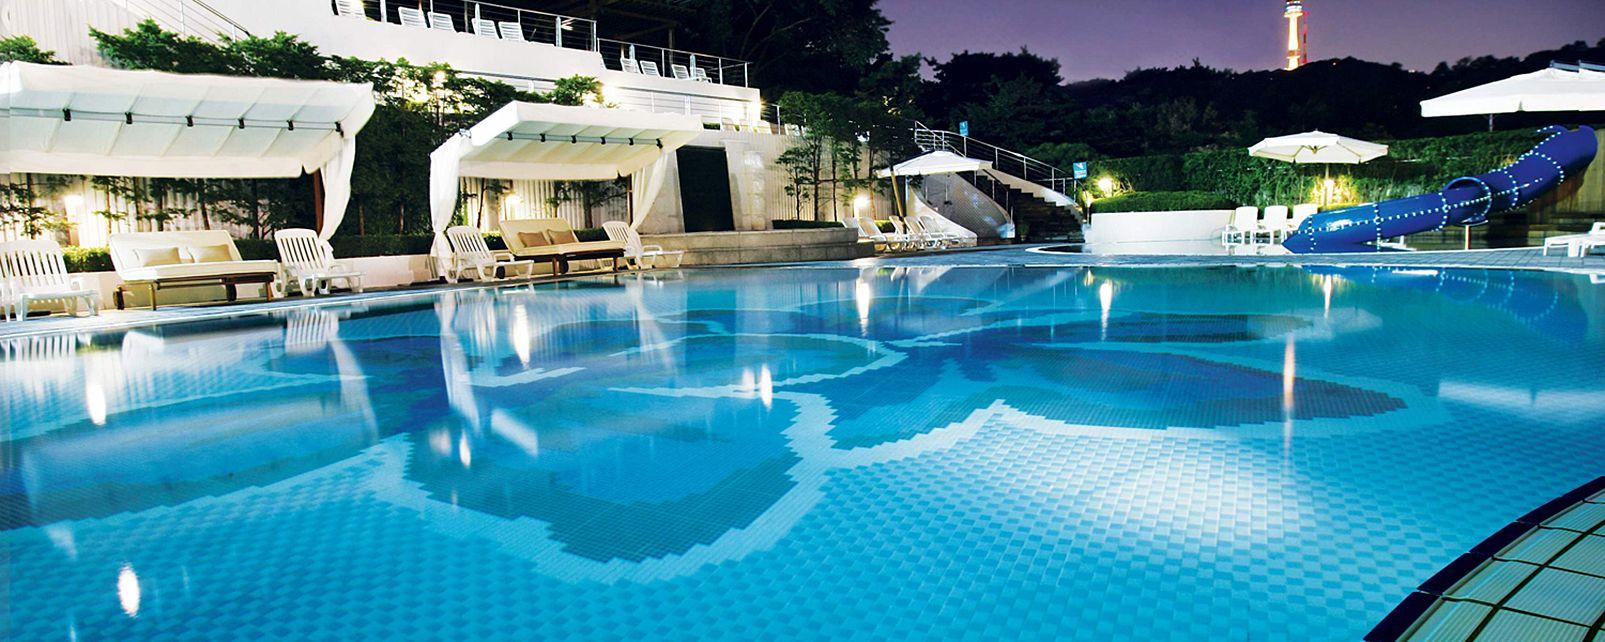 poolshilla1